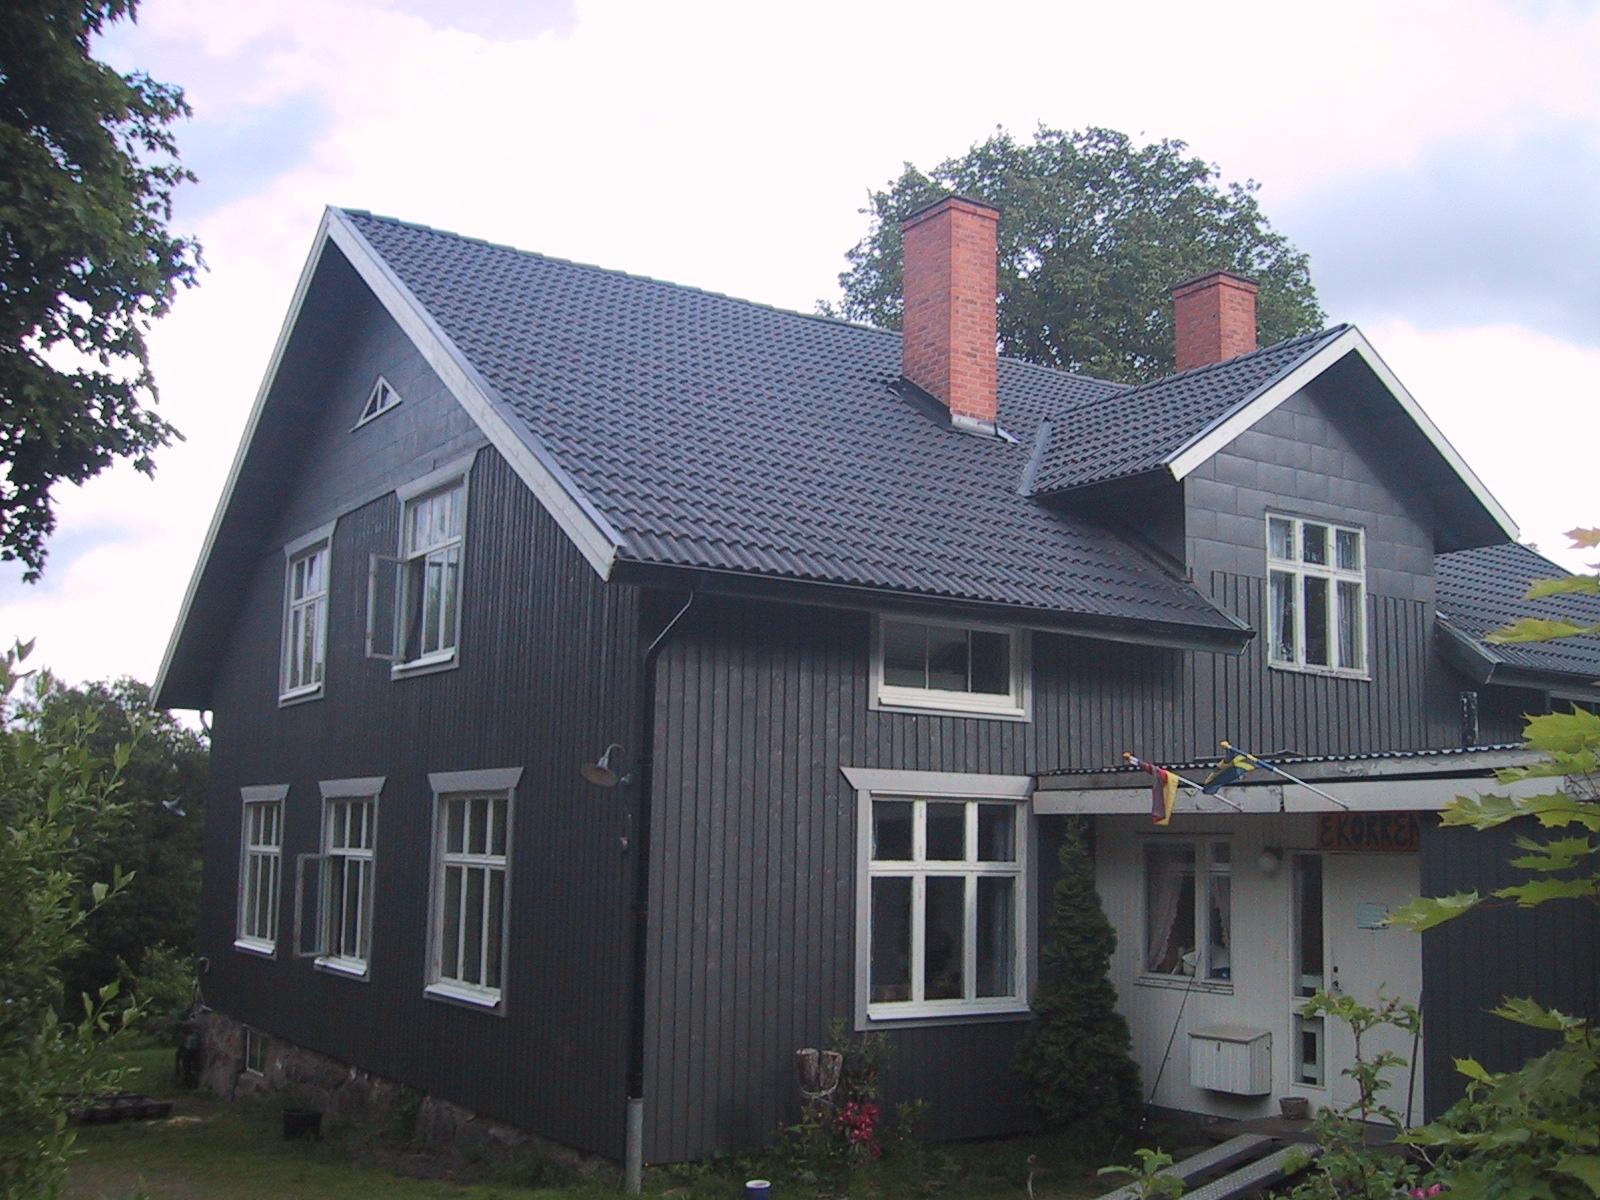 ferienhaus smaland alstermo schweden. Black Bedroom Furniture Sets. Home Design Ideas